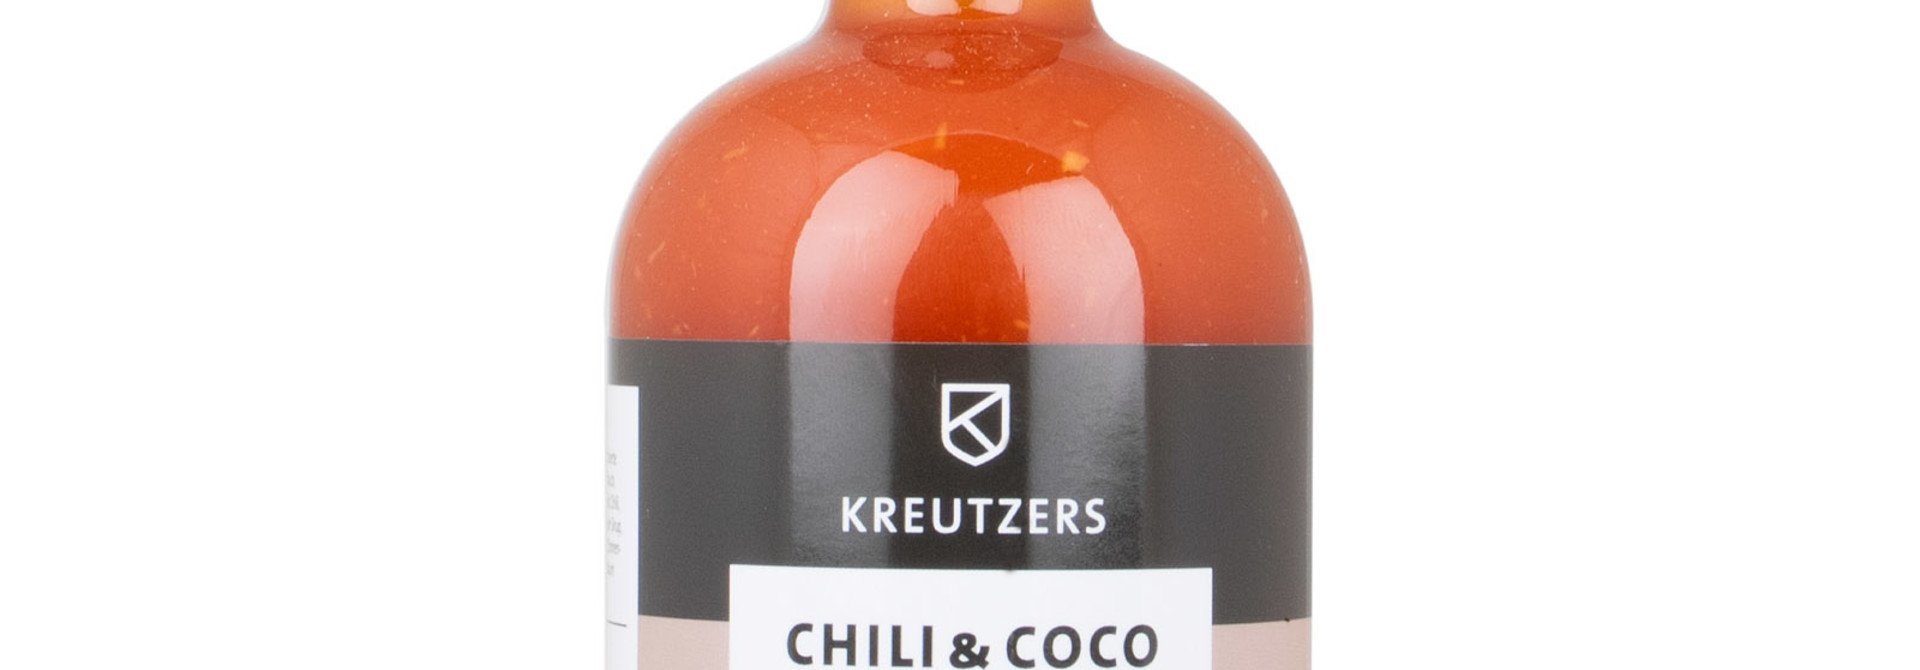 Saus.Guru X Kreutzers - Chili & Coco